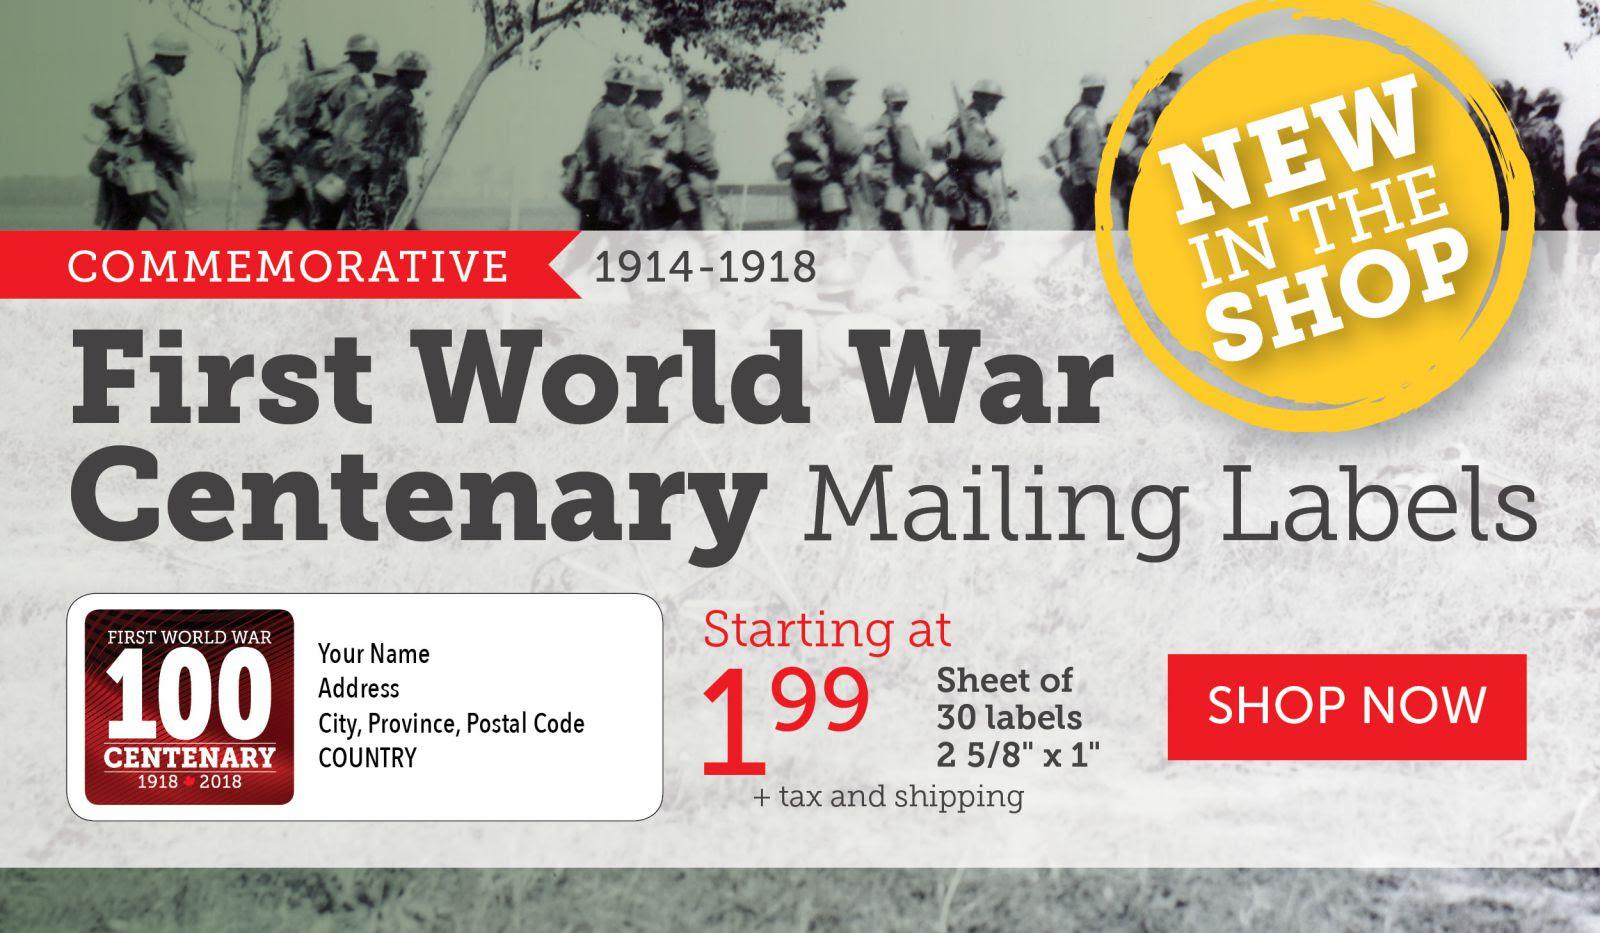 First World War Centenary Mailing Labels (Version 2)